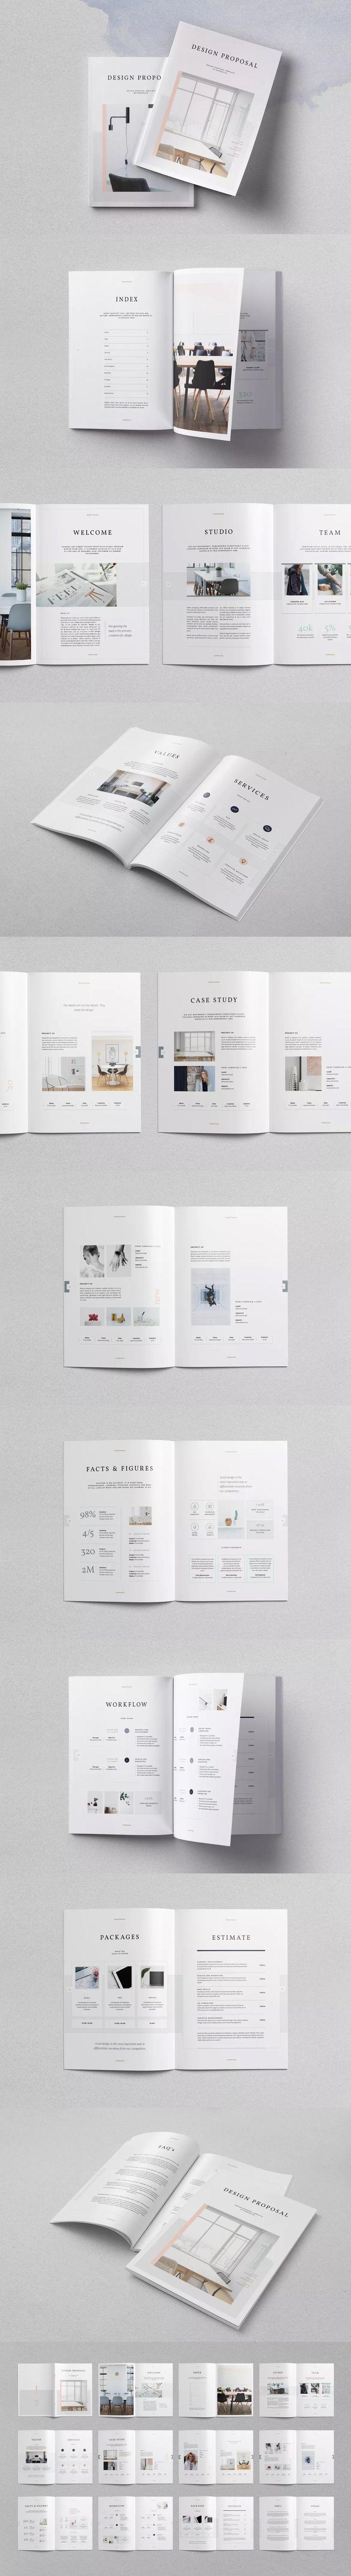 71 Best Proposal Brochure Templates Images On Pinterest